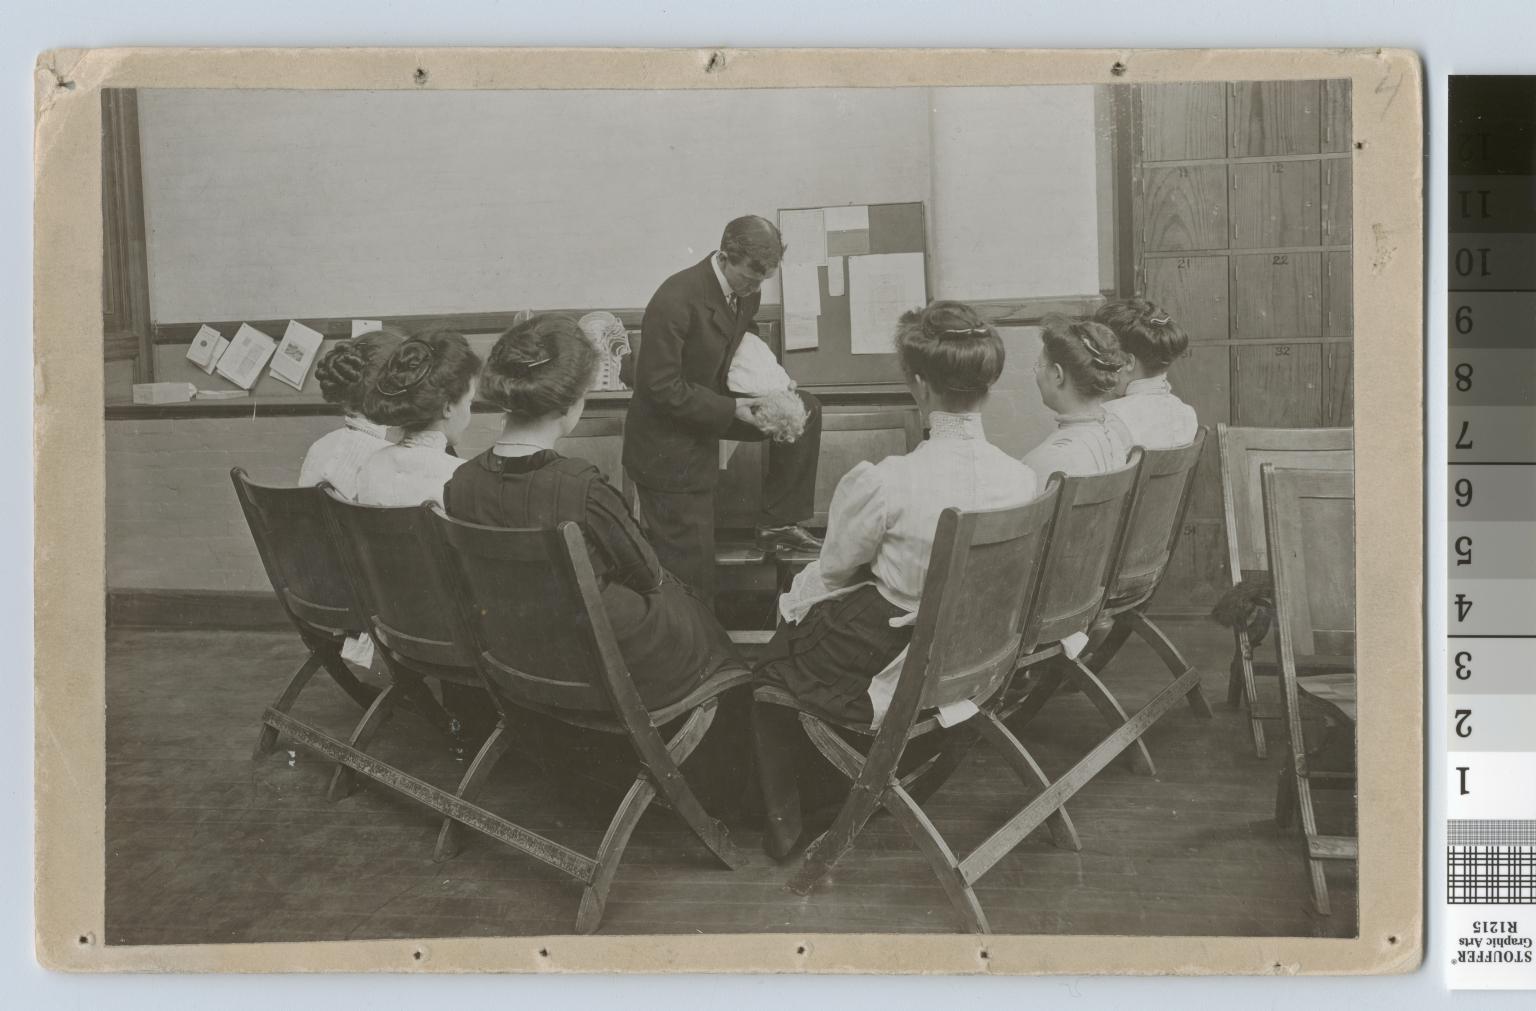 Choking prevention demonstration, Rochester Athenaeum and Mechanics Institute [1901-1915]